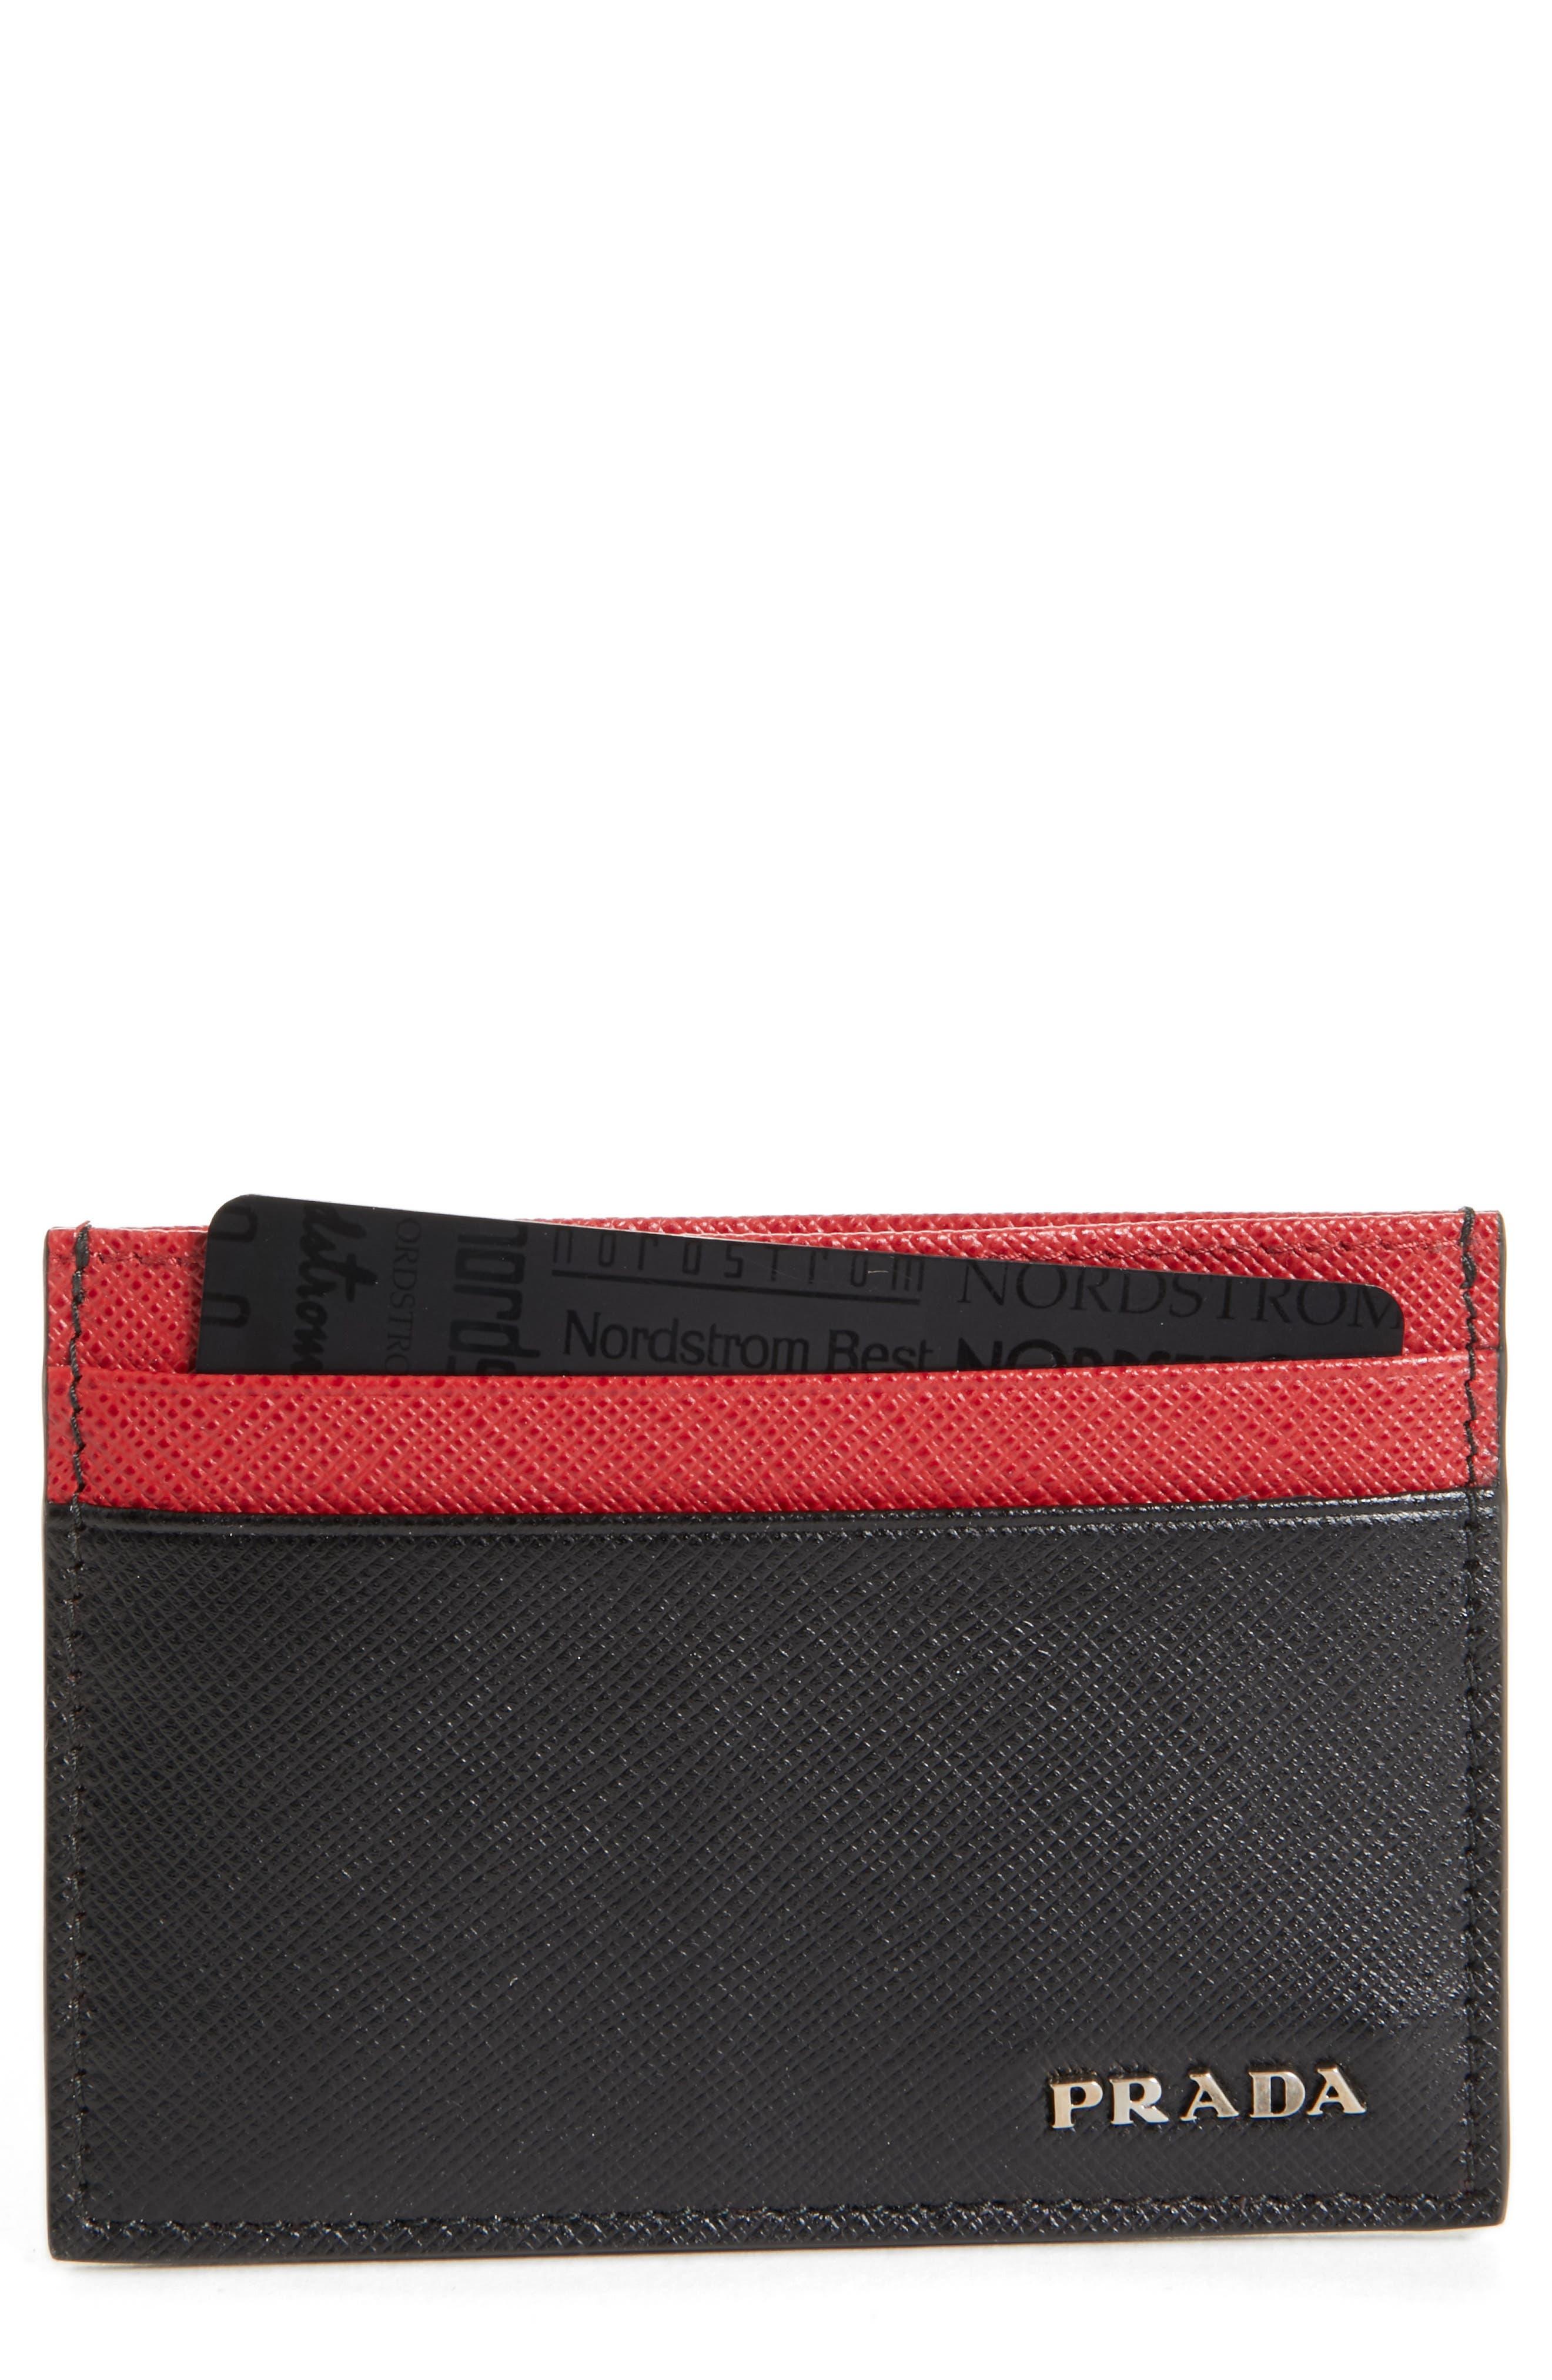 Men\'s Prada Wallets | Nordstrom